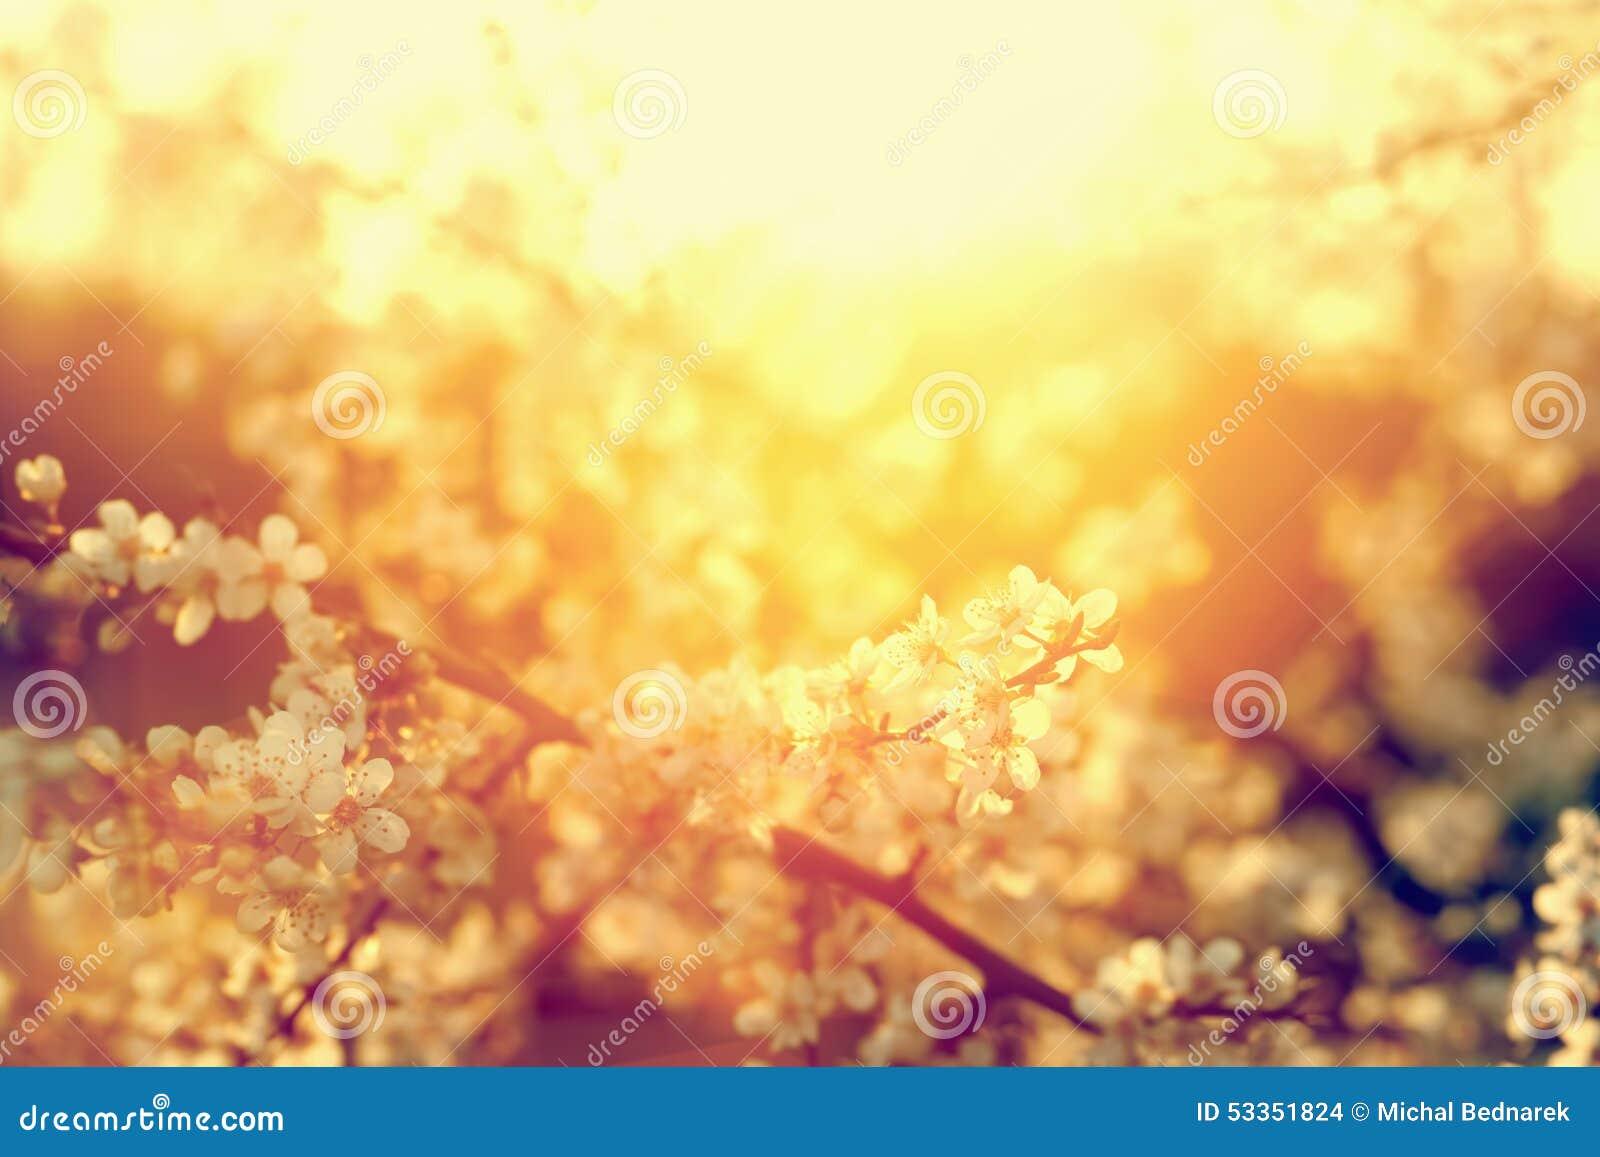 Spring tree flowers blossom, bloom in warm sun. Vintage